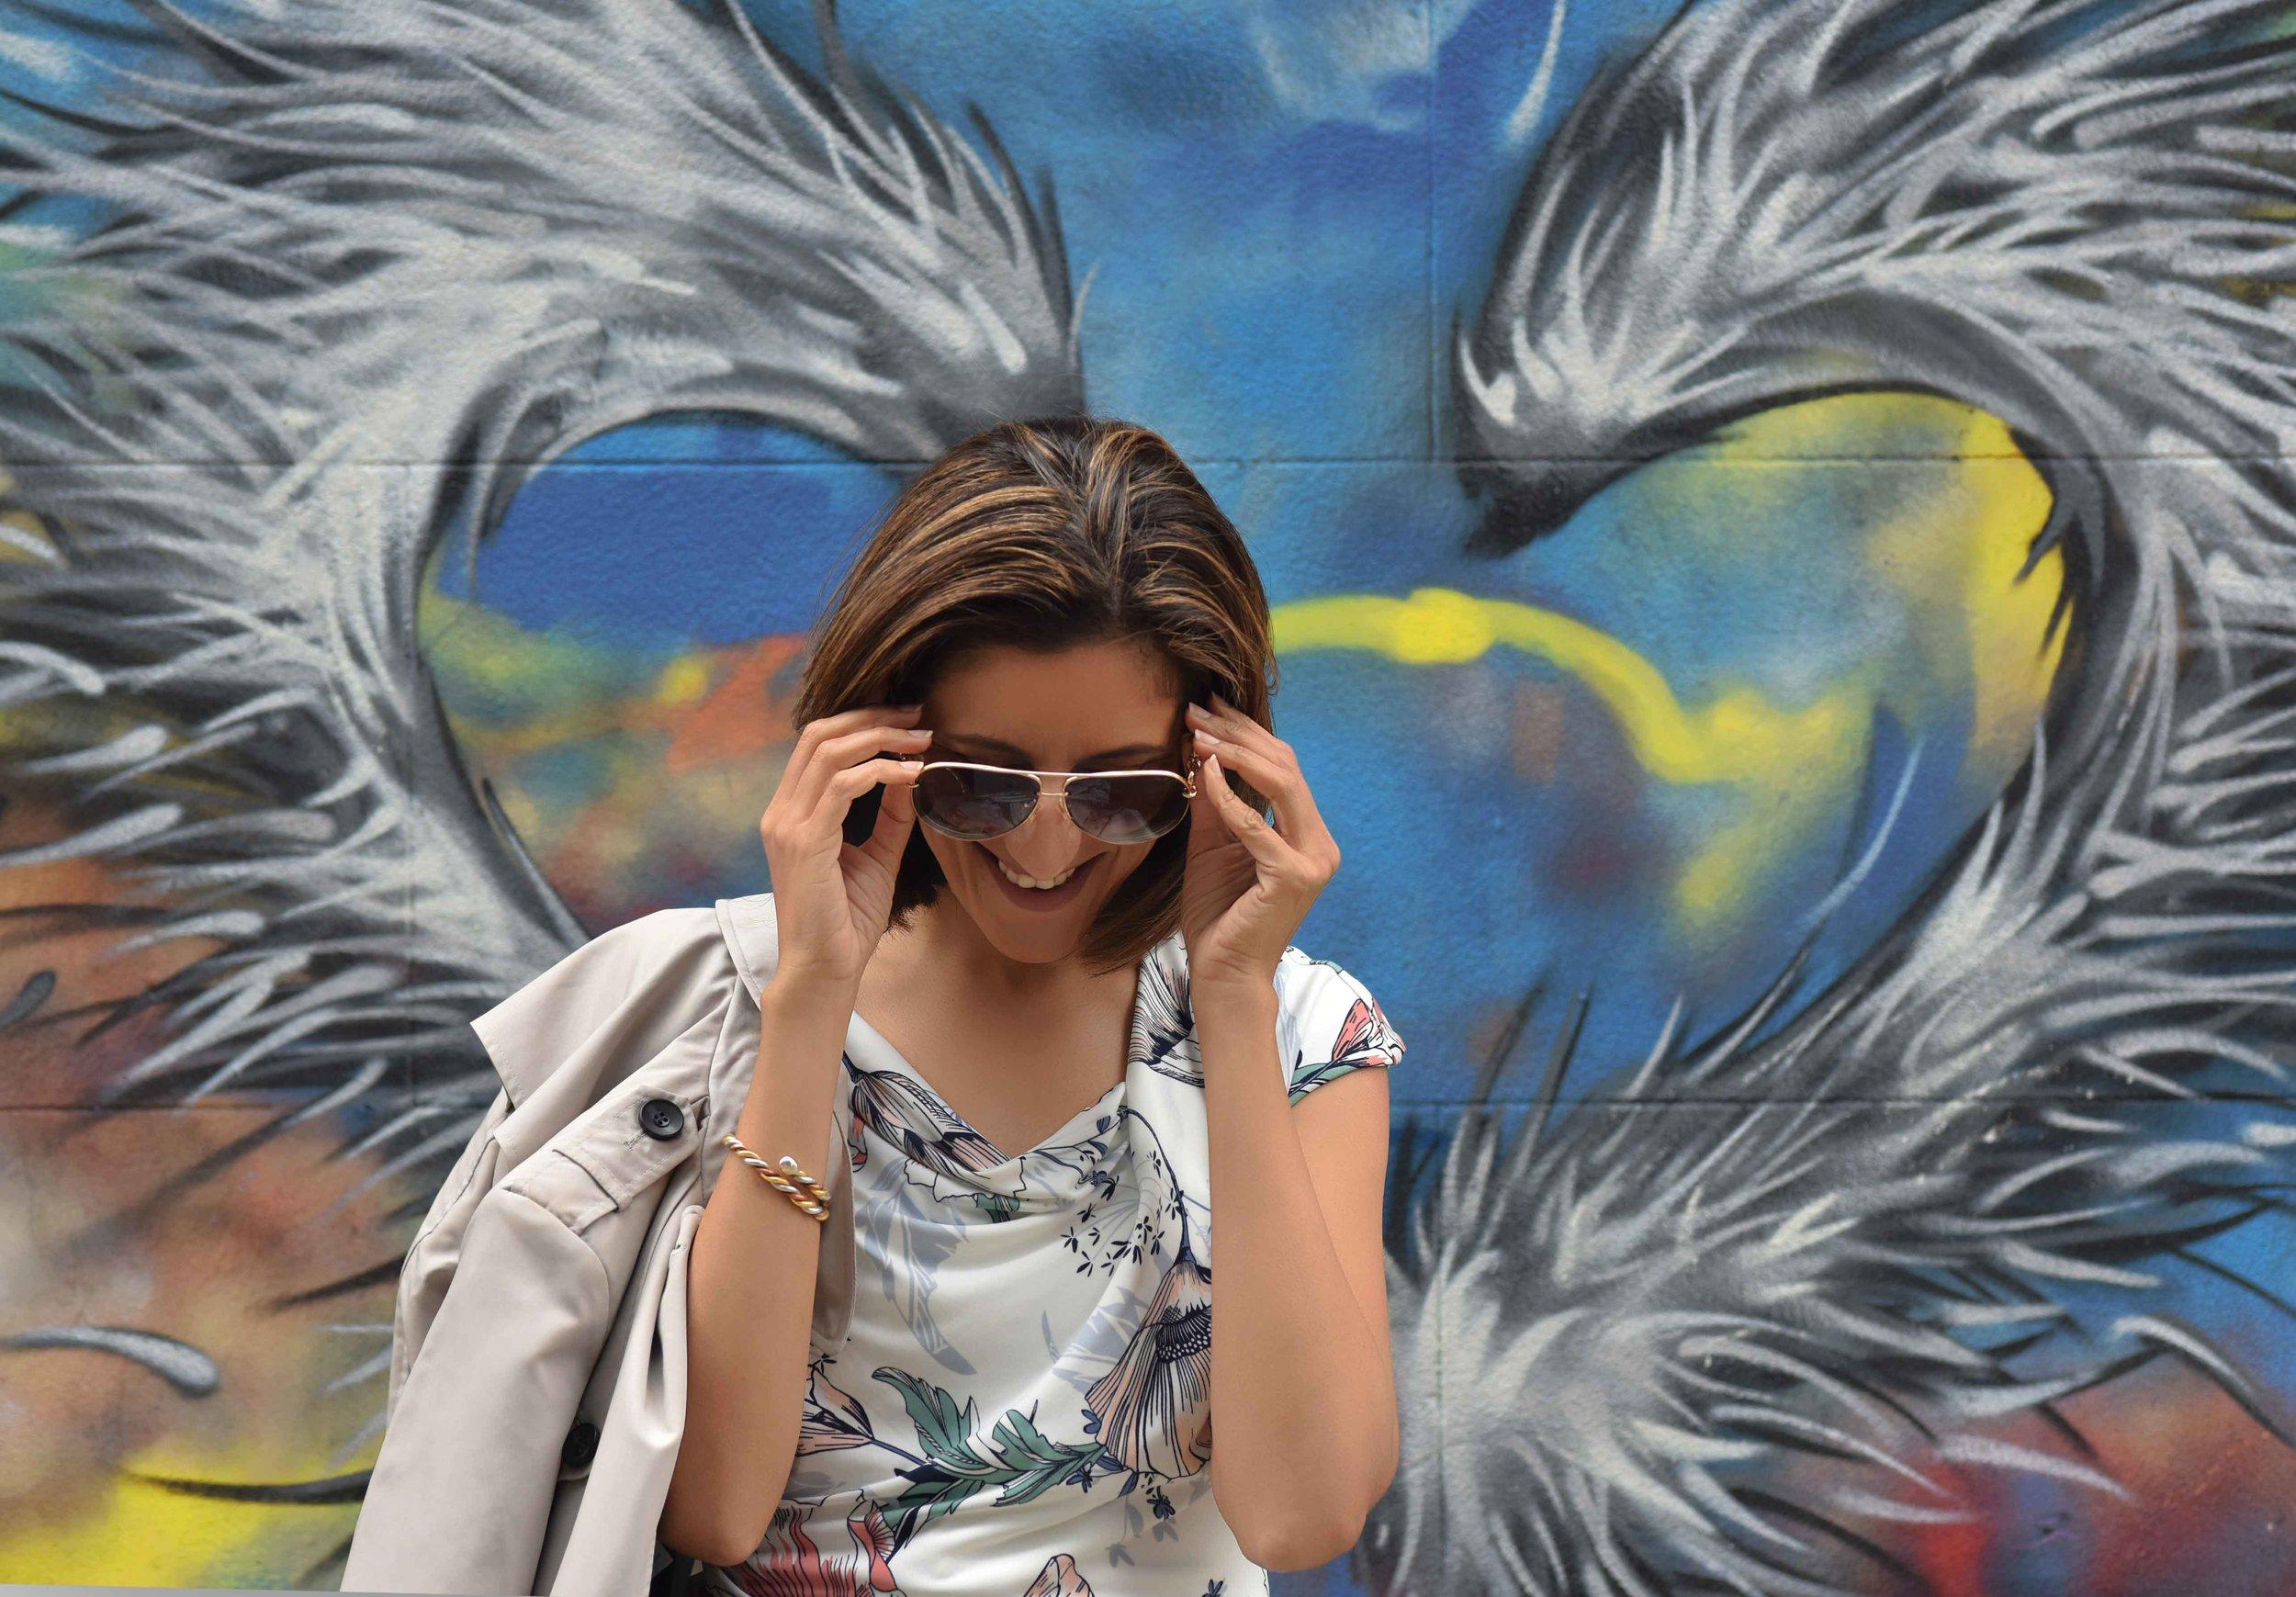 MNS dress, MNS trench, Gucci sunglasses, Graffiti artwork, street fashion, street art, Bricklane, Shoreditch, London, U.K. Photo: Nina Shaw, Image©sourcingstyle.com